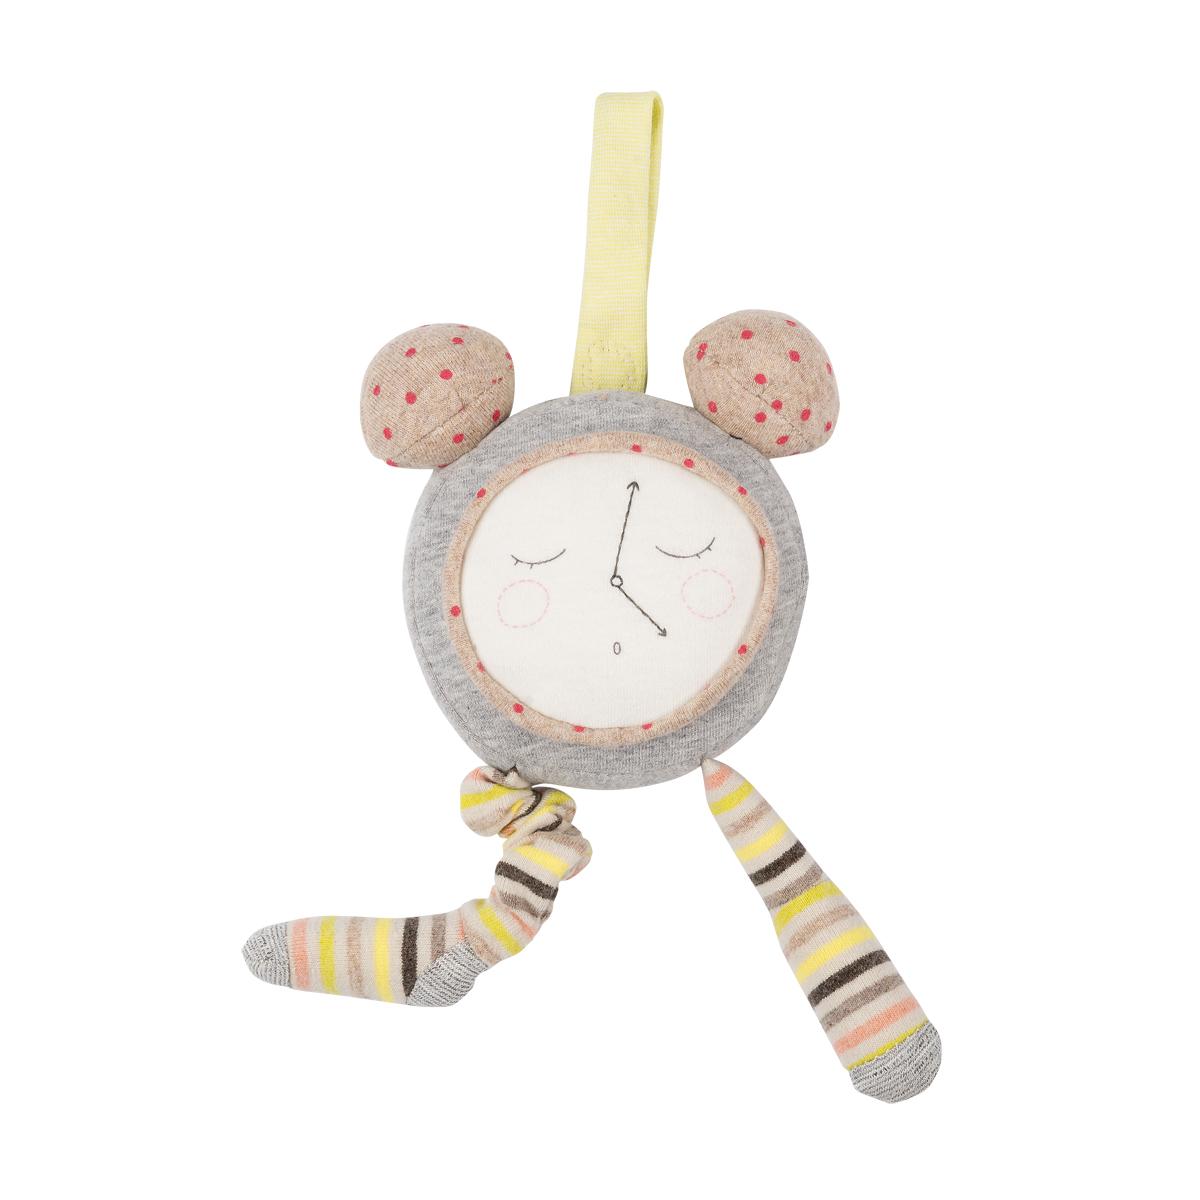 「Les PetitDodos」目覚まし時計のブルブル